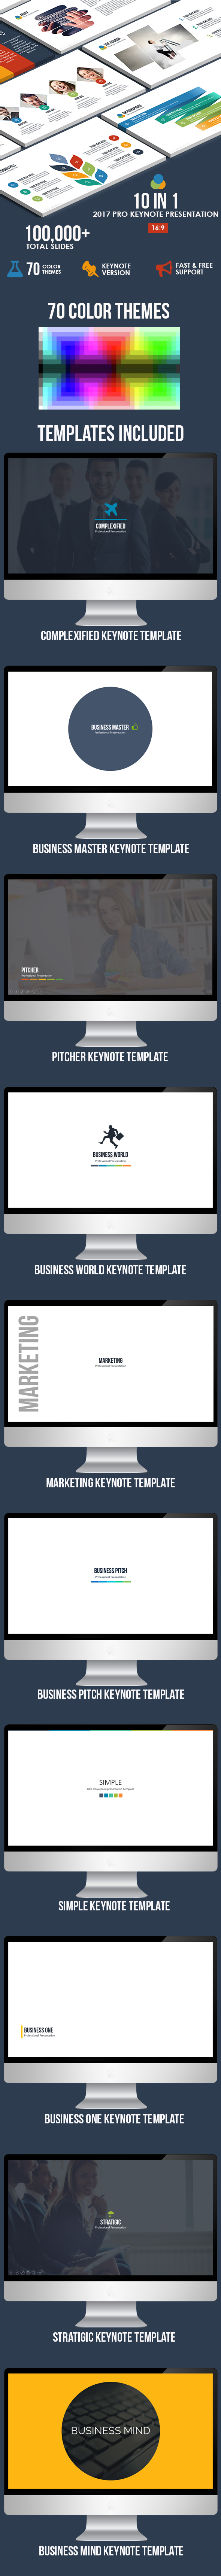 10 IN 1 - 2017 Pro Keynote Bundle - Business Keynote Templates